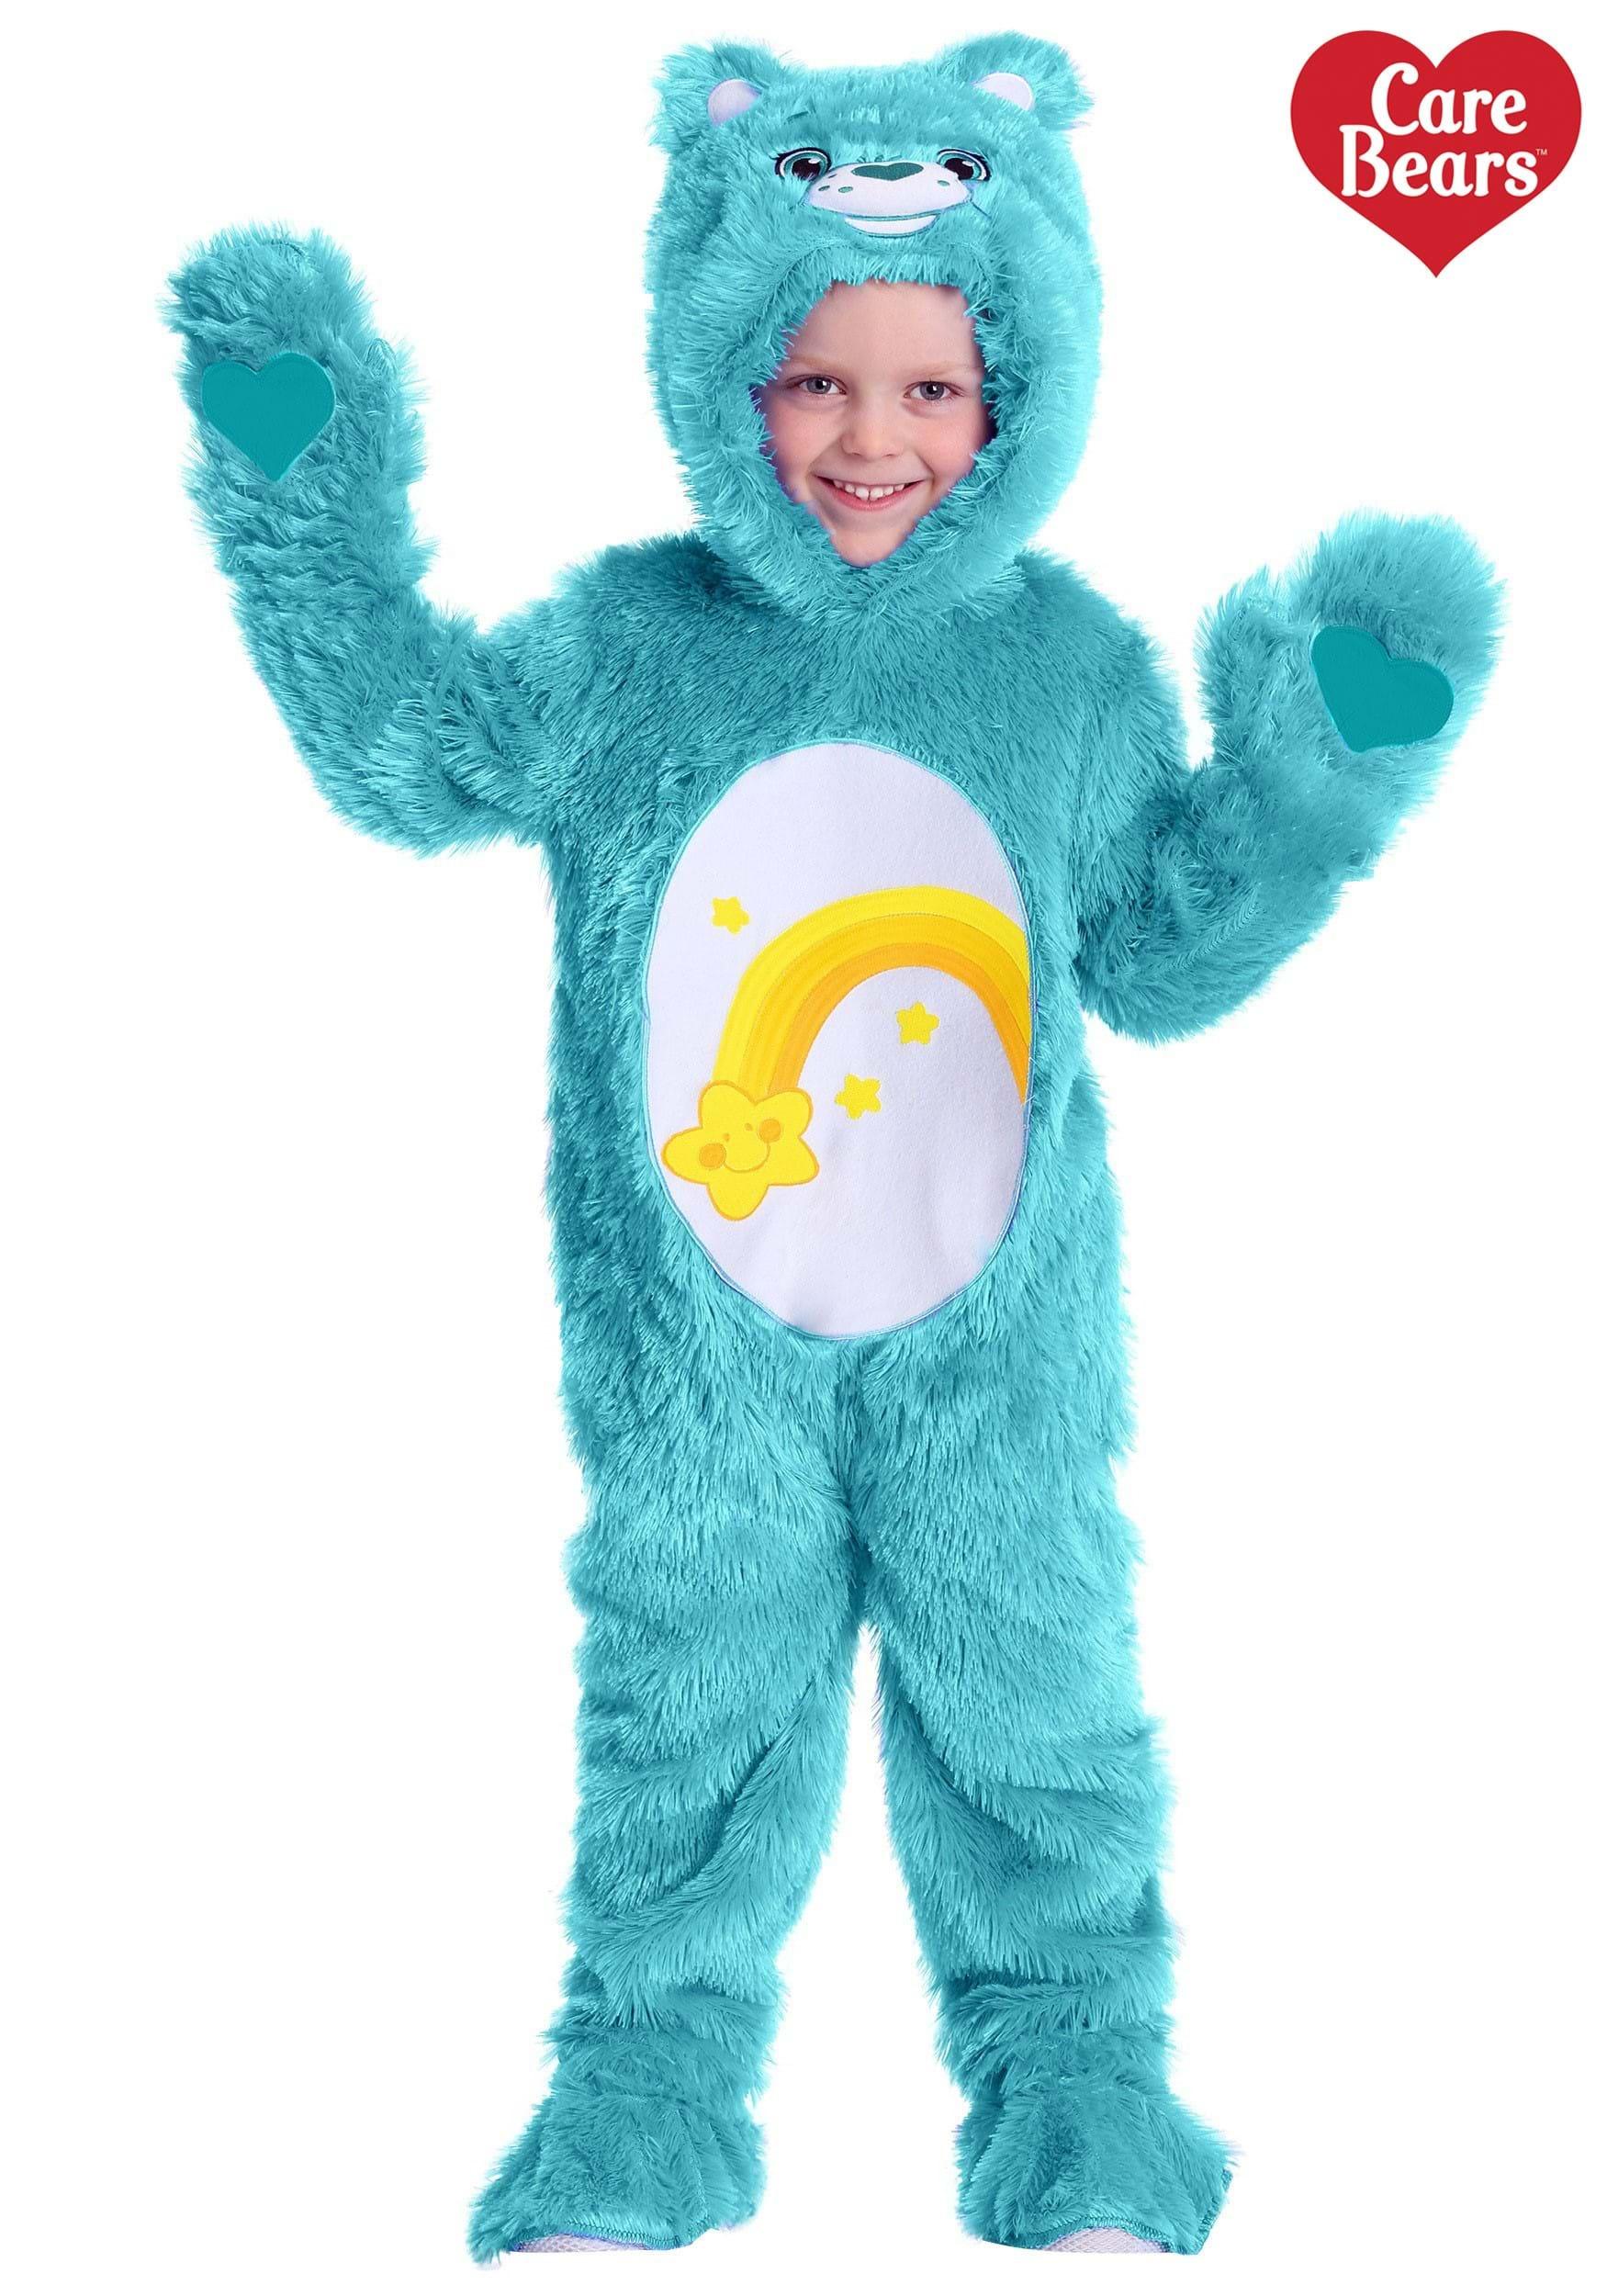 Deluxe Care Bears Grumpy Bear Blue Soft Plush Kids Toddler Costume 2T